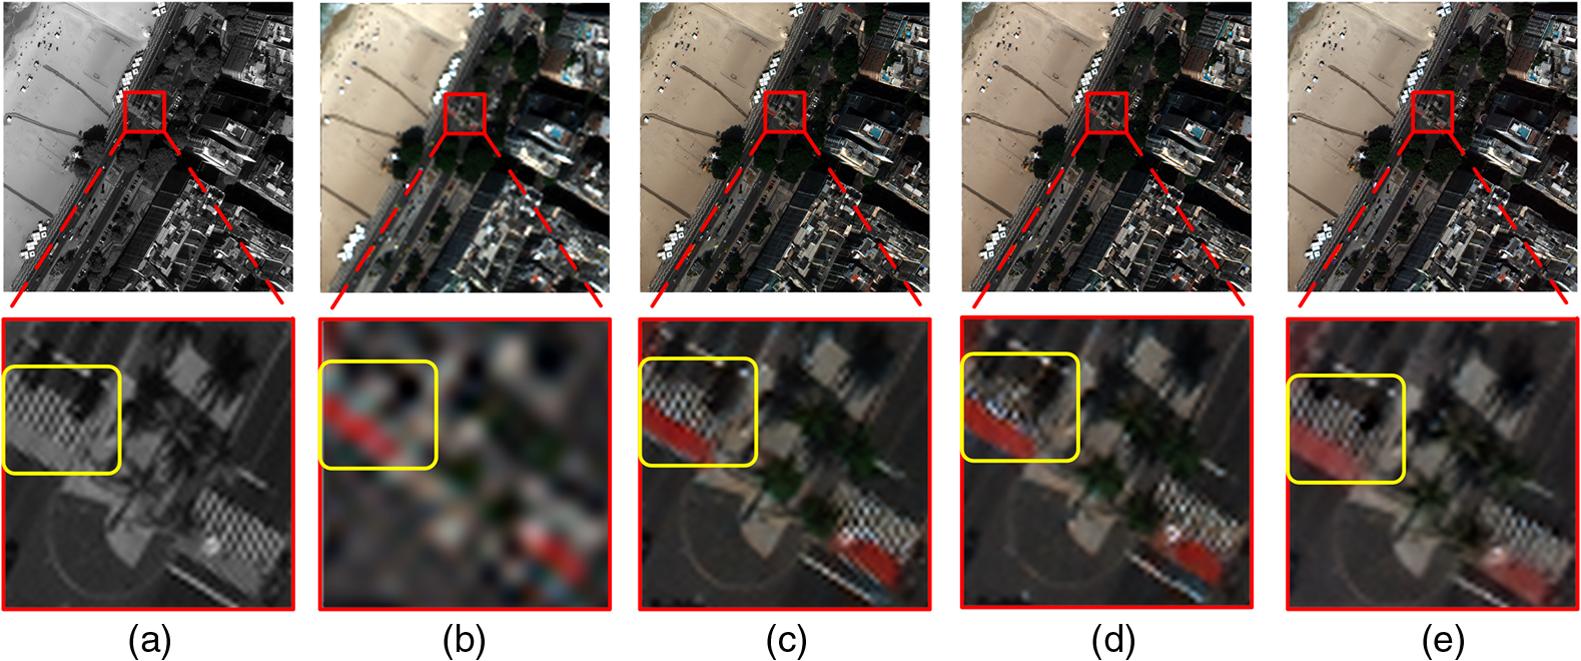 SFTGAN: a generative adversarial network for pan-sharpening